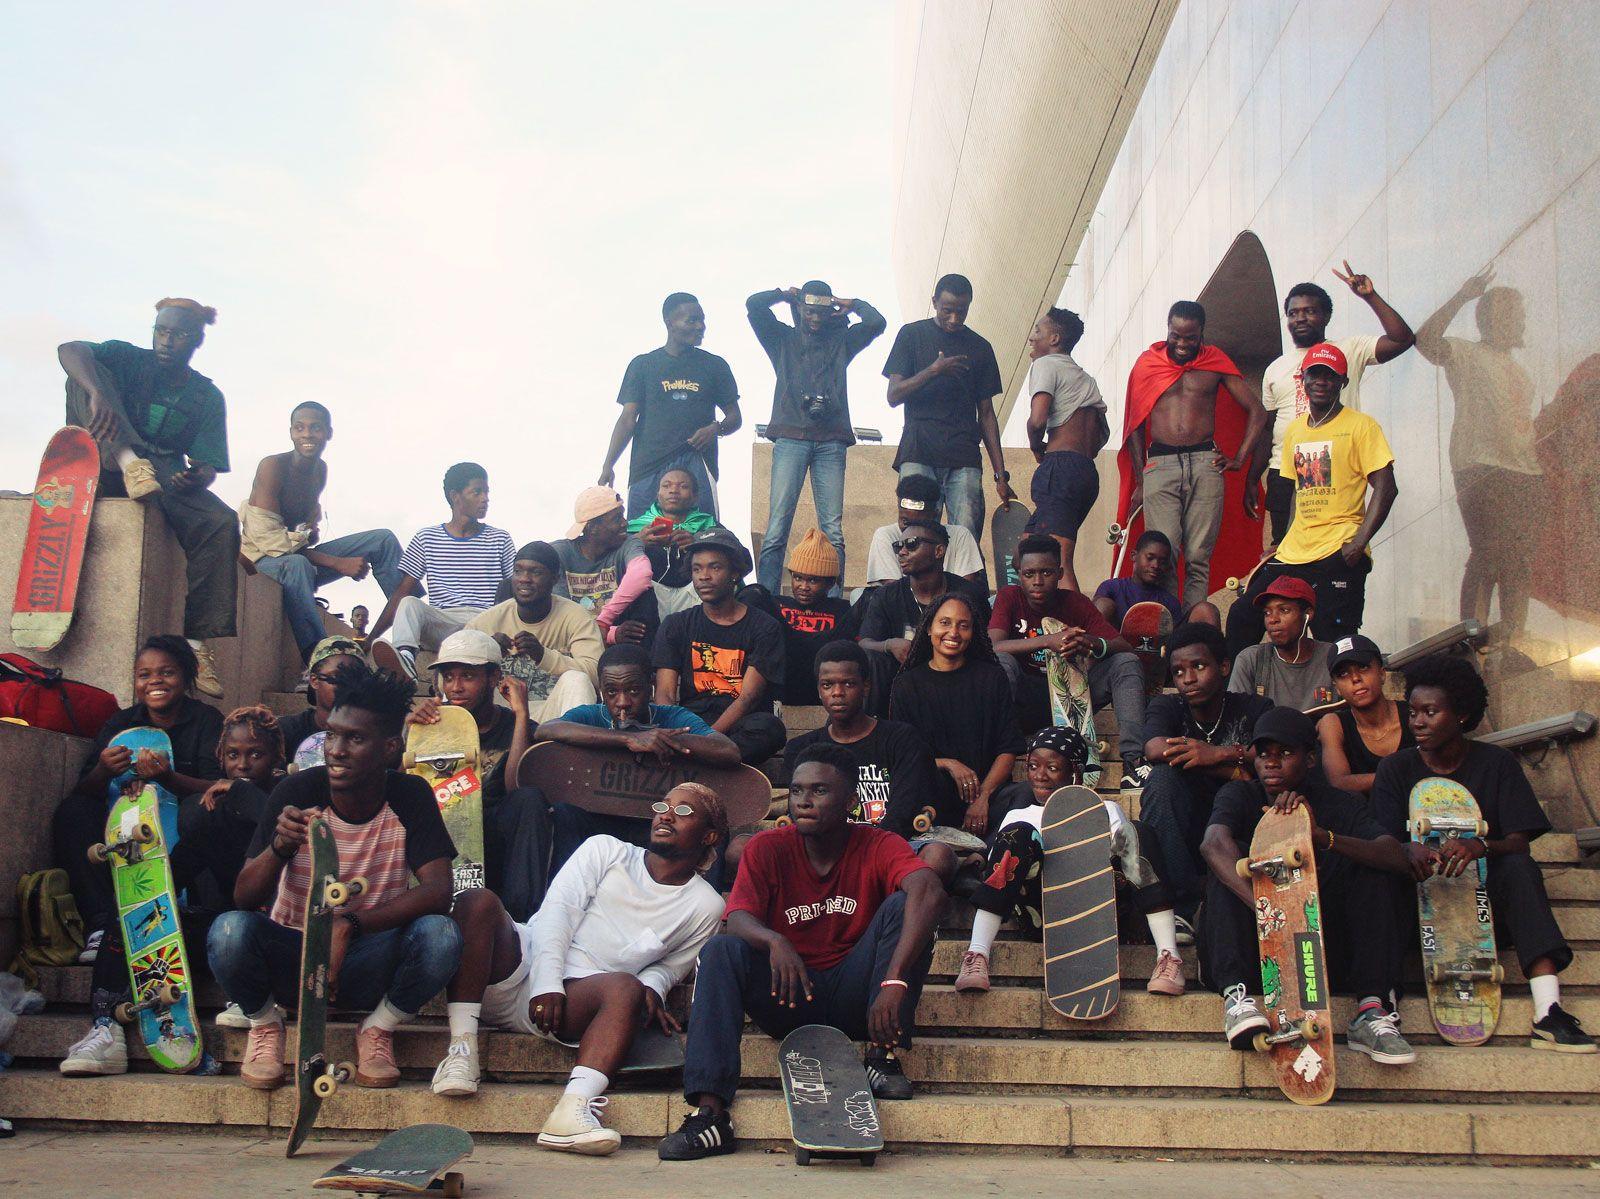 ghanas-first-skate-park-much-skateboarding-main